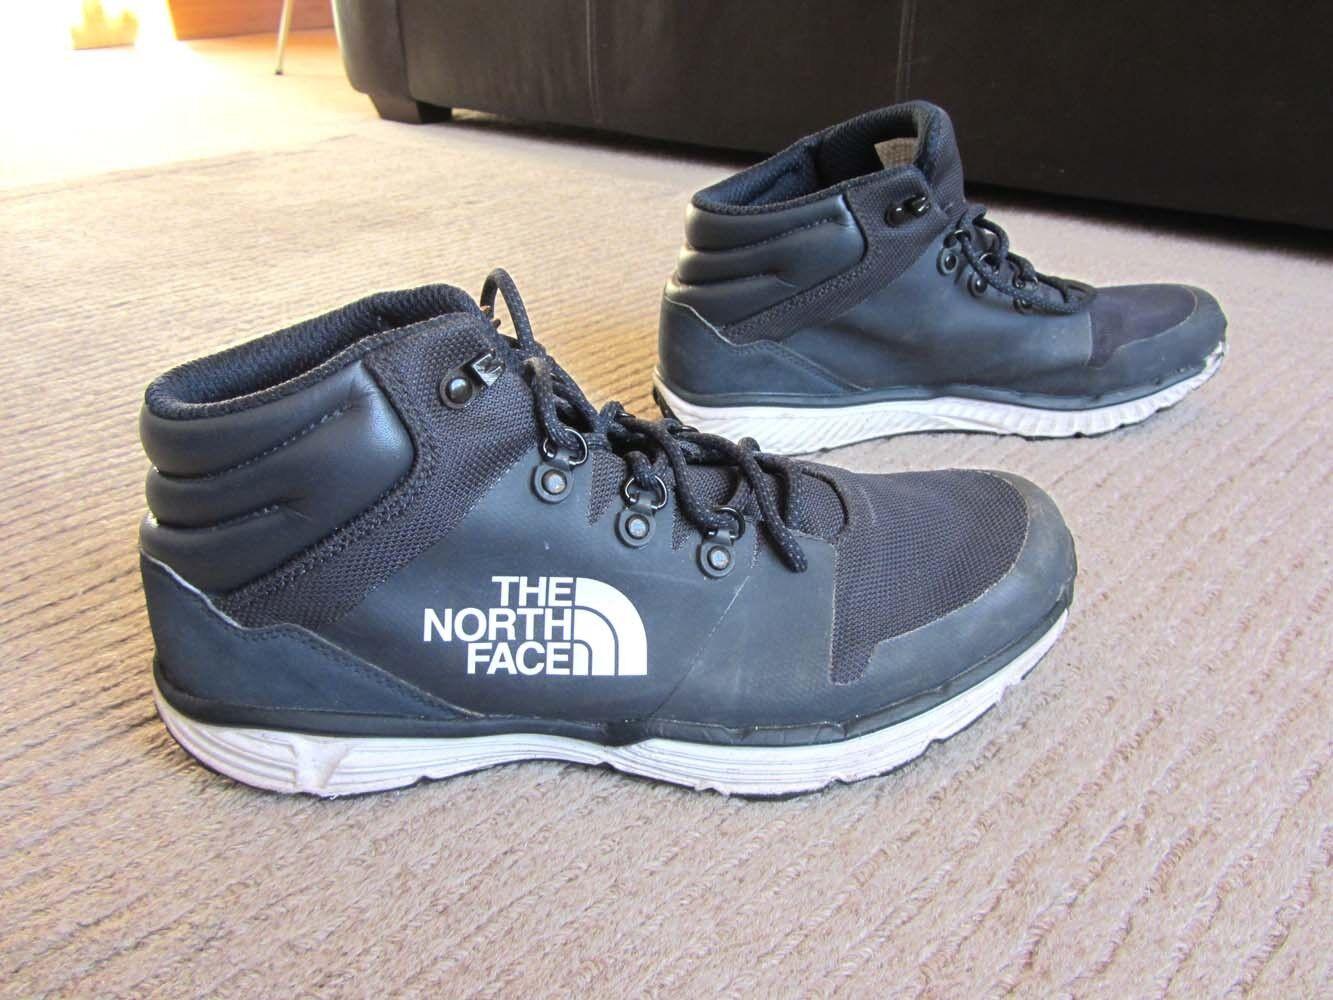 NORTH FACE Casual Dress Mens Walking Boots